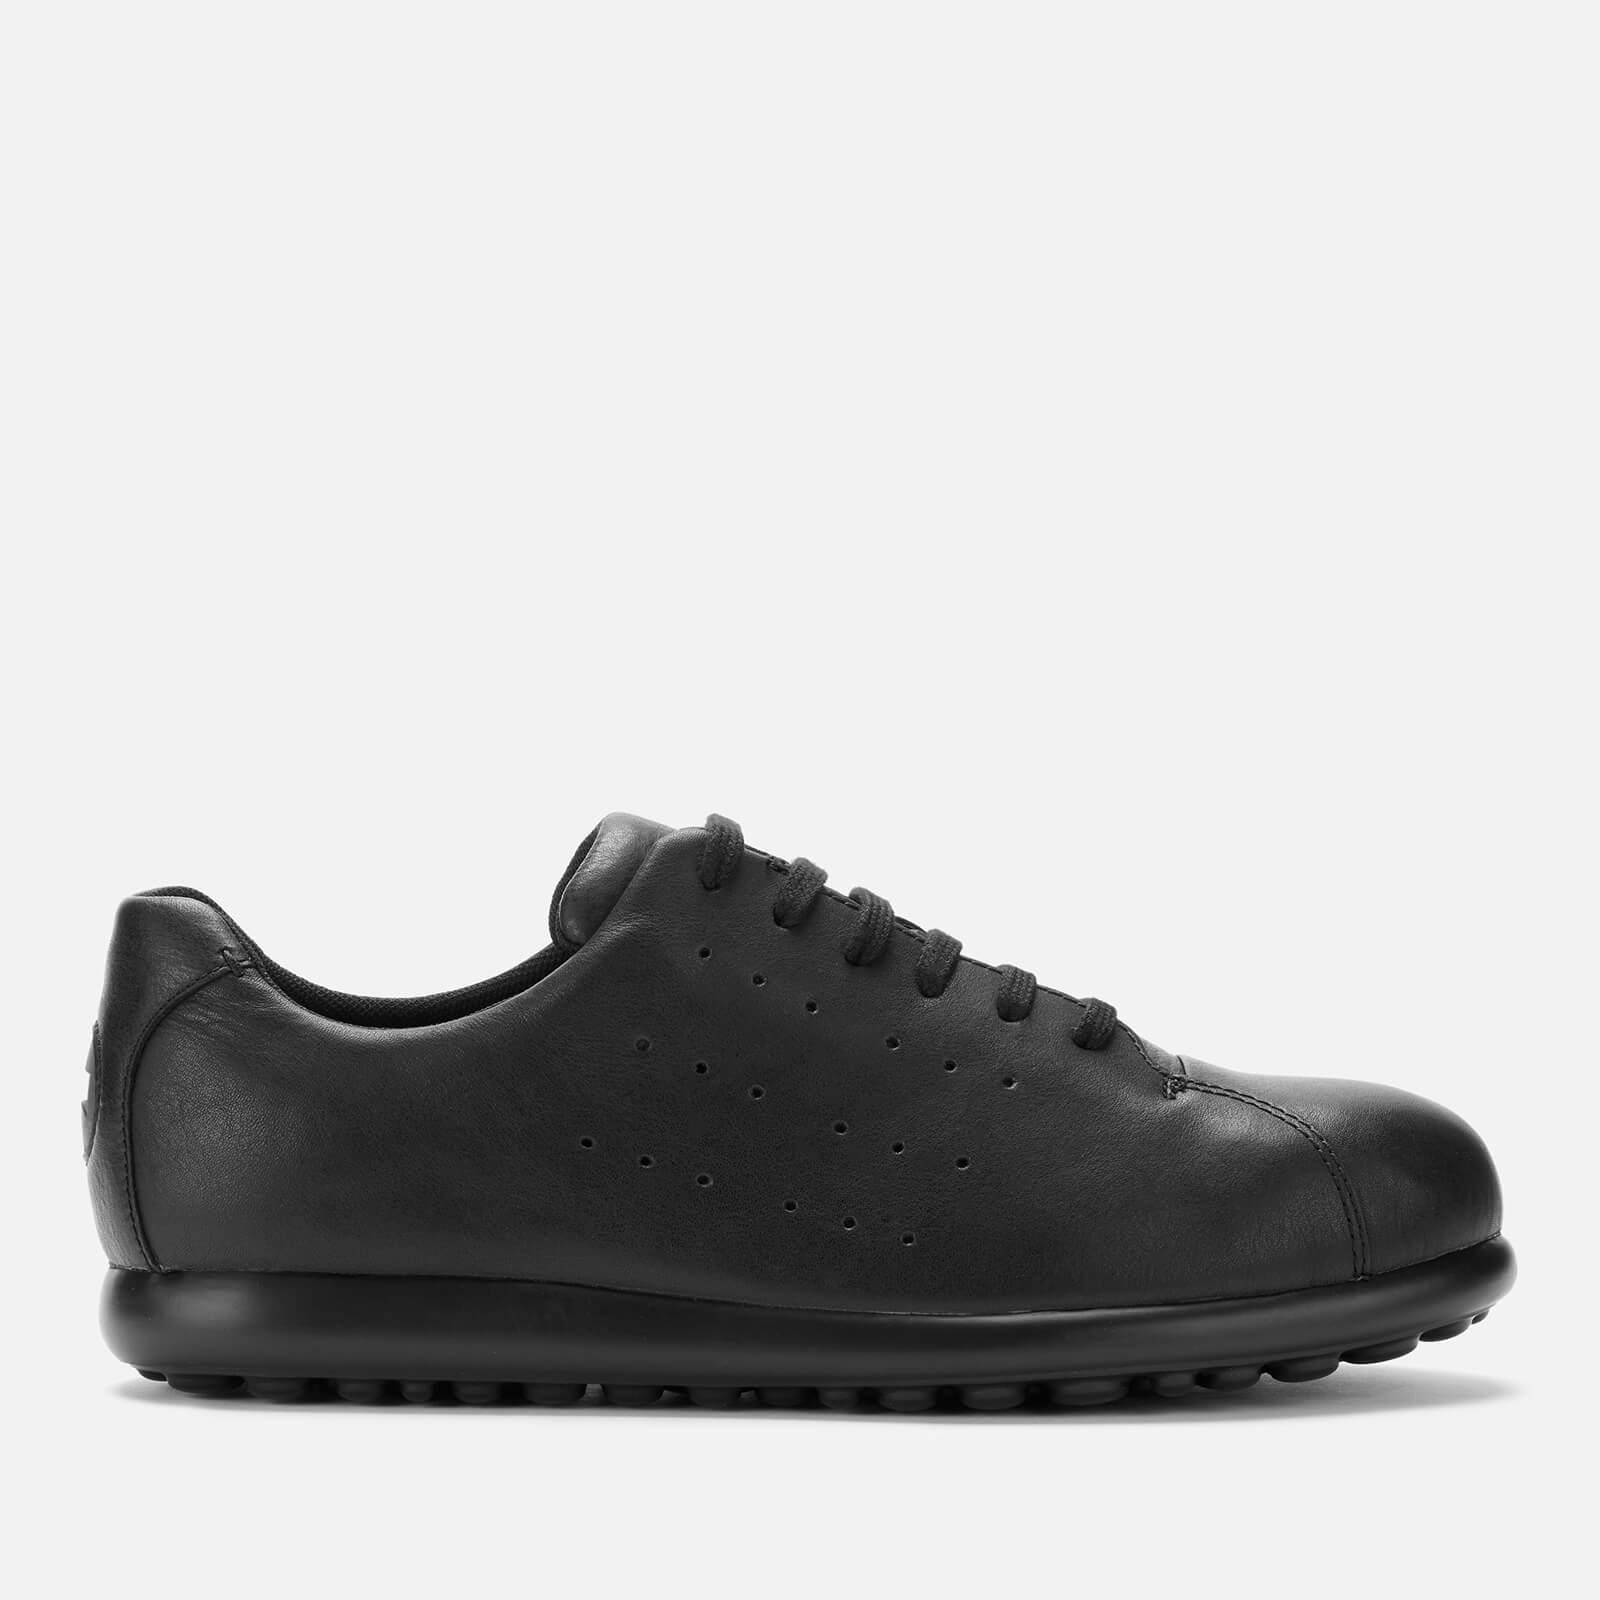 Camper Men's Pelotas Leather Low Top Shoes - Black - UK 10